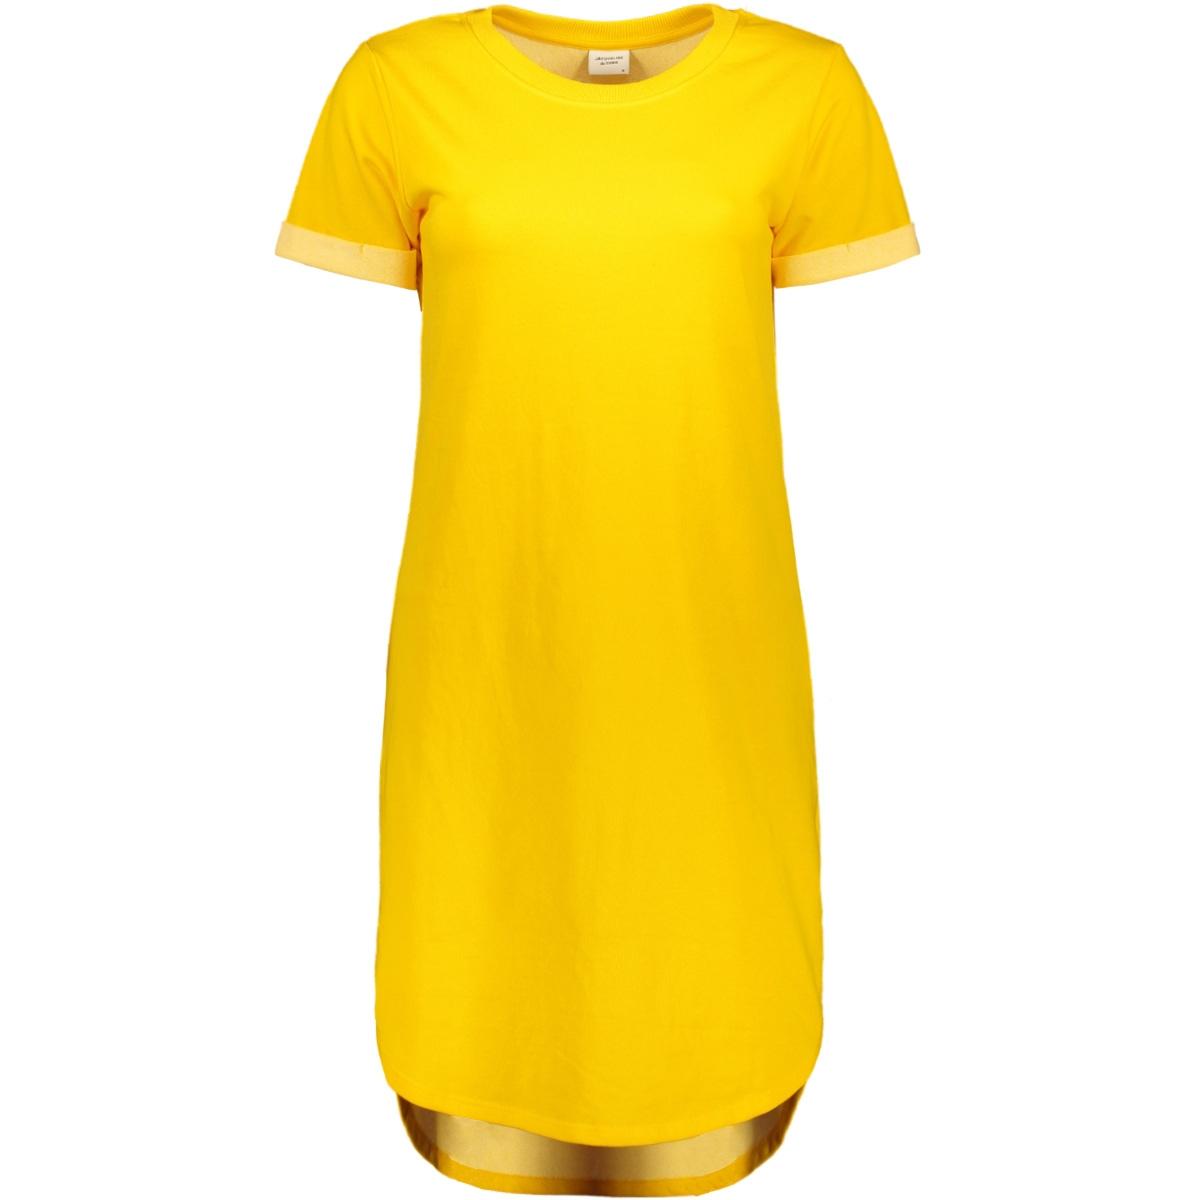 jdyivy s/s dress jrs 15174793 jacqueline de yong jurk lemon